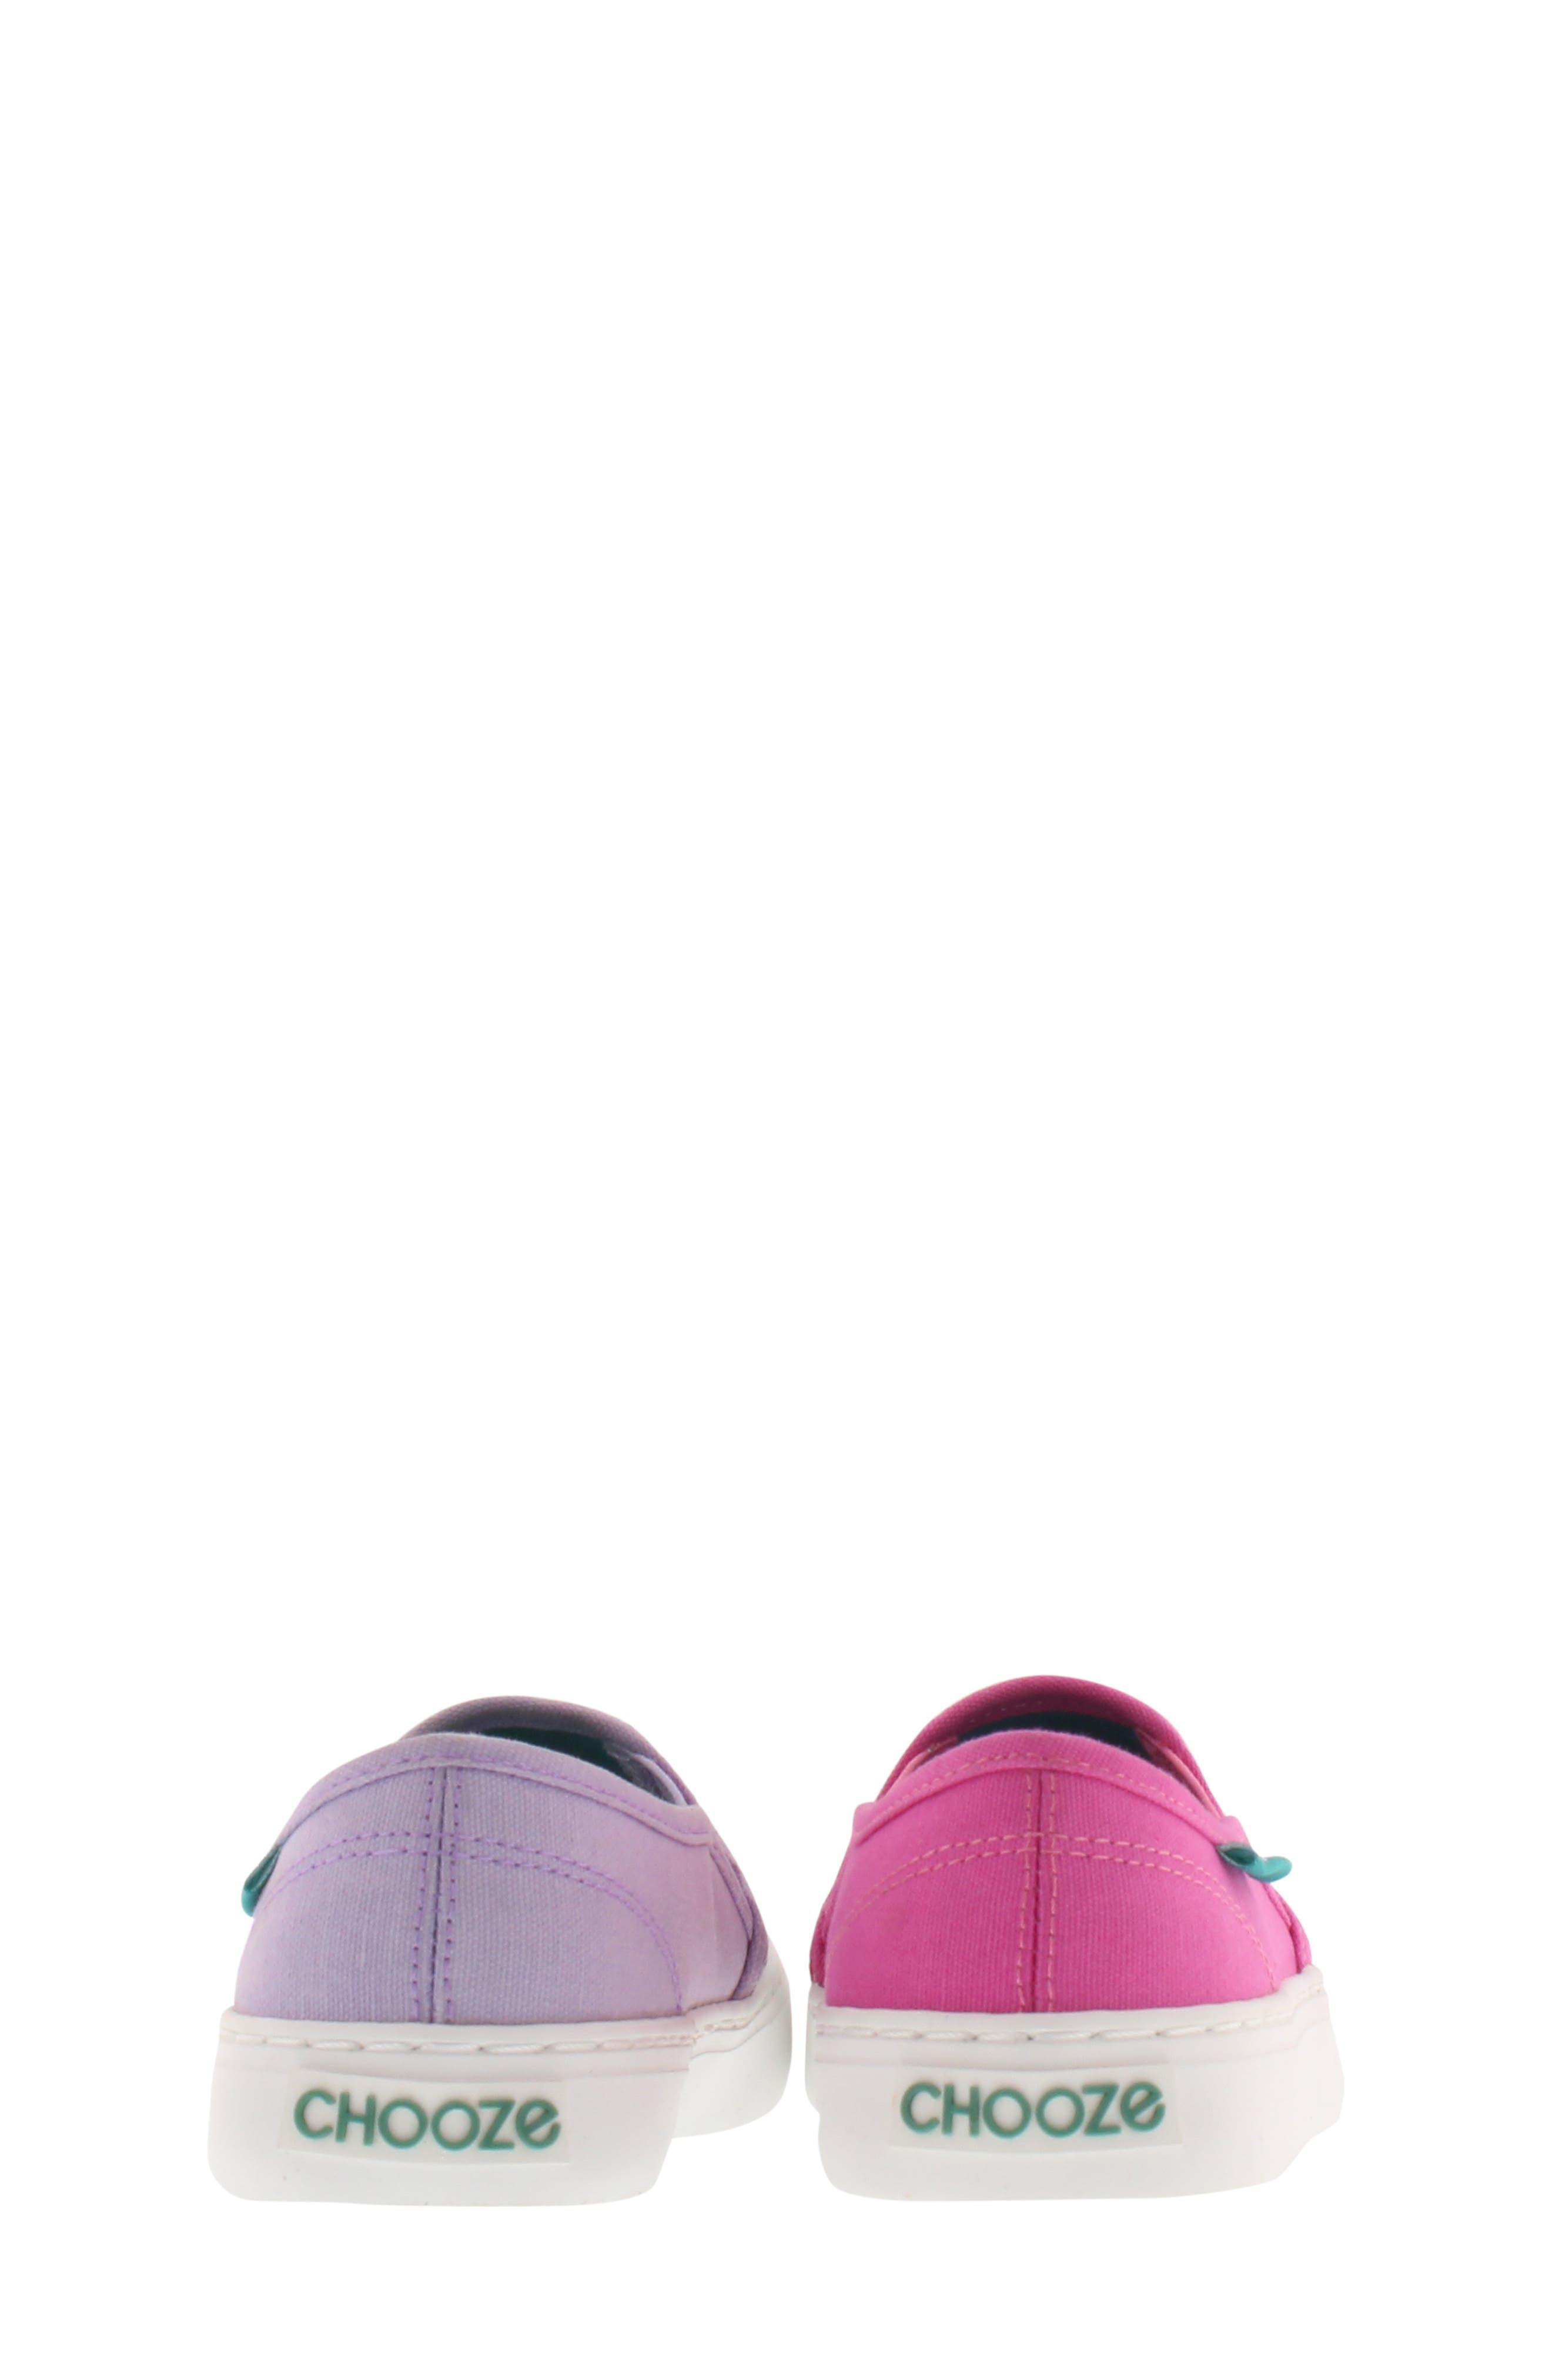 CHOOZE, Move Motion Slip-On Sneaker, Alternate thumbnail 7, color, PINK LAVENDER